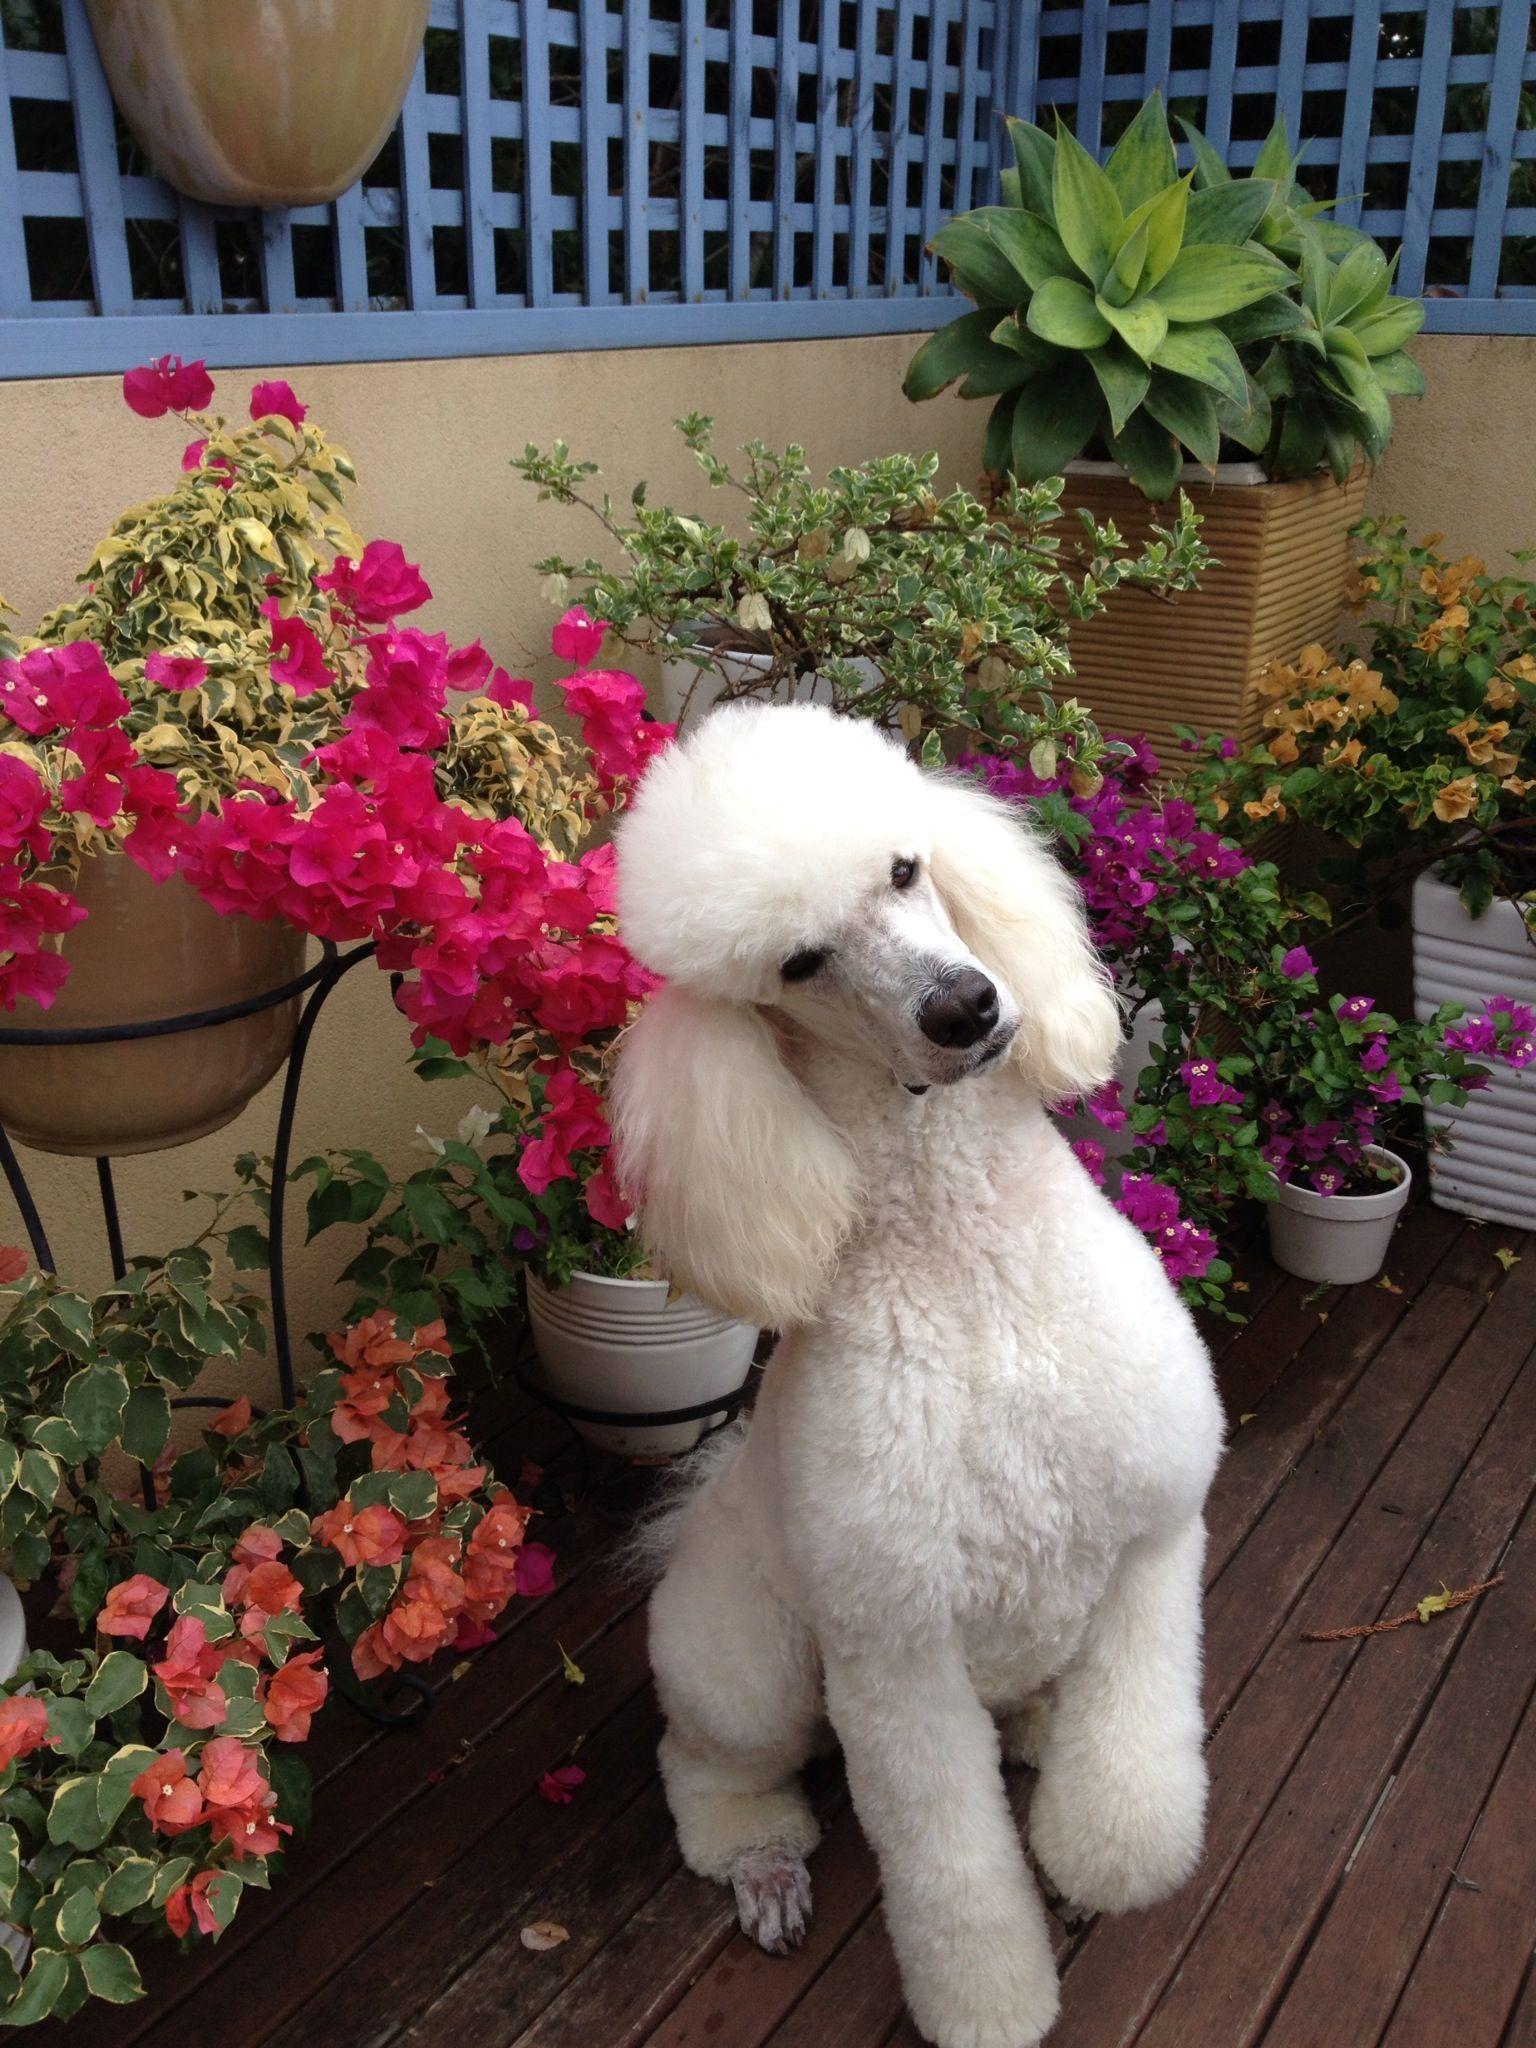 Poodle Sporting A Lamb Trim Poodle Golden Doodle Poodle Dog